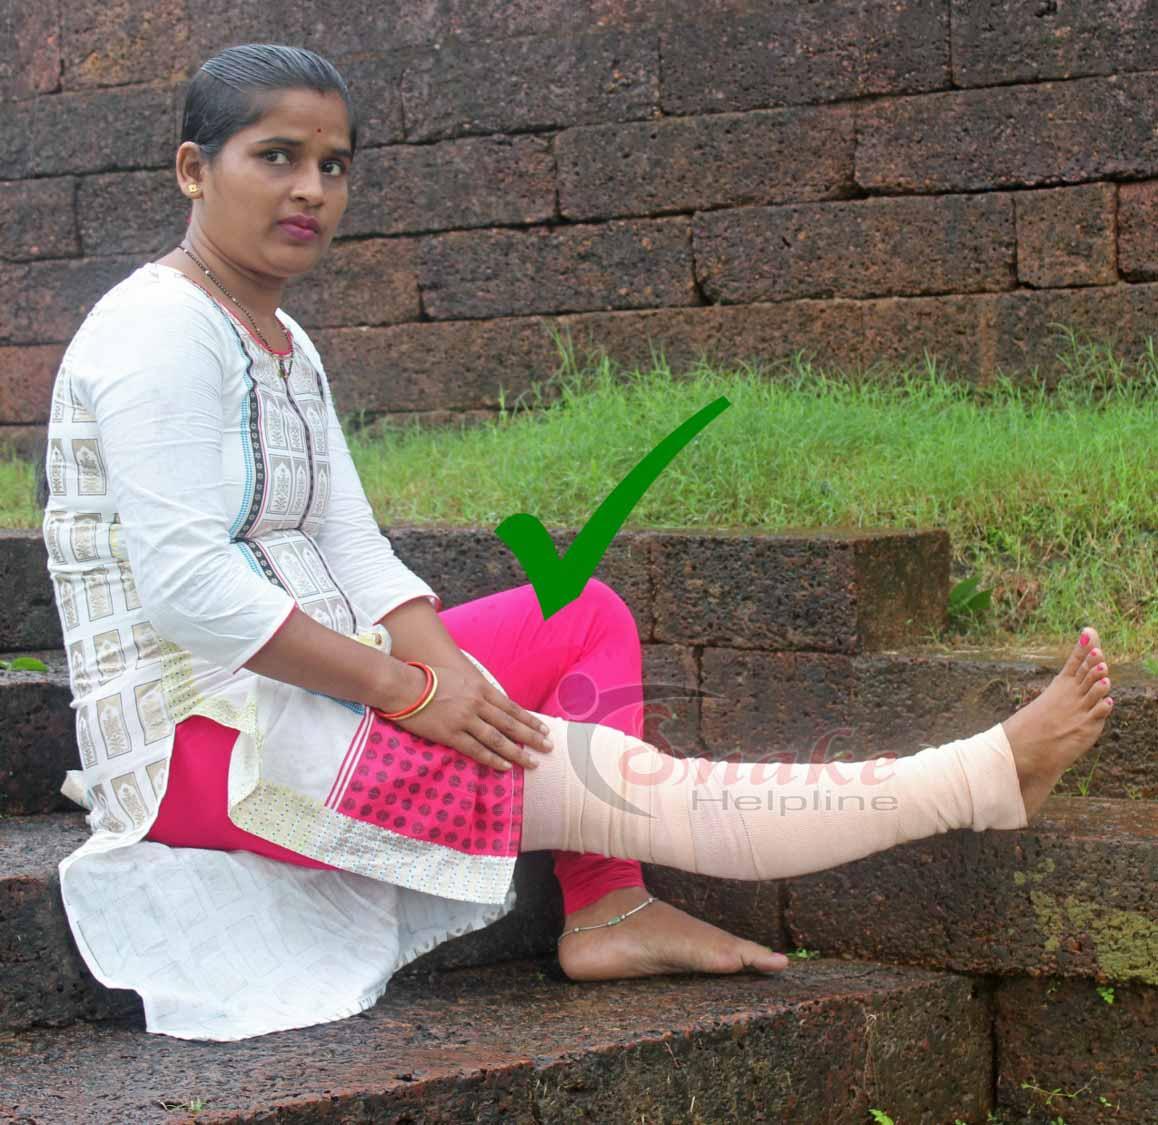 Do not use any wooden splint on leg.